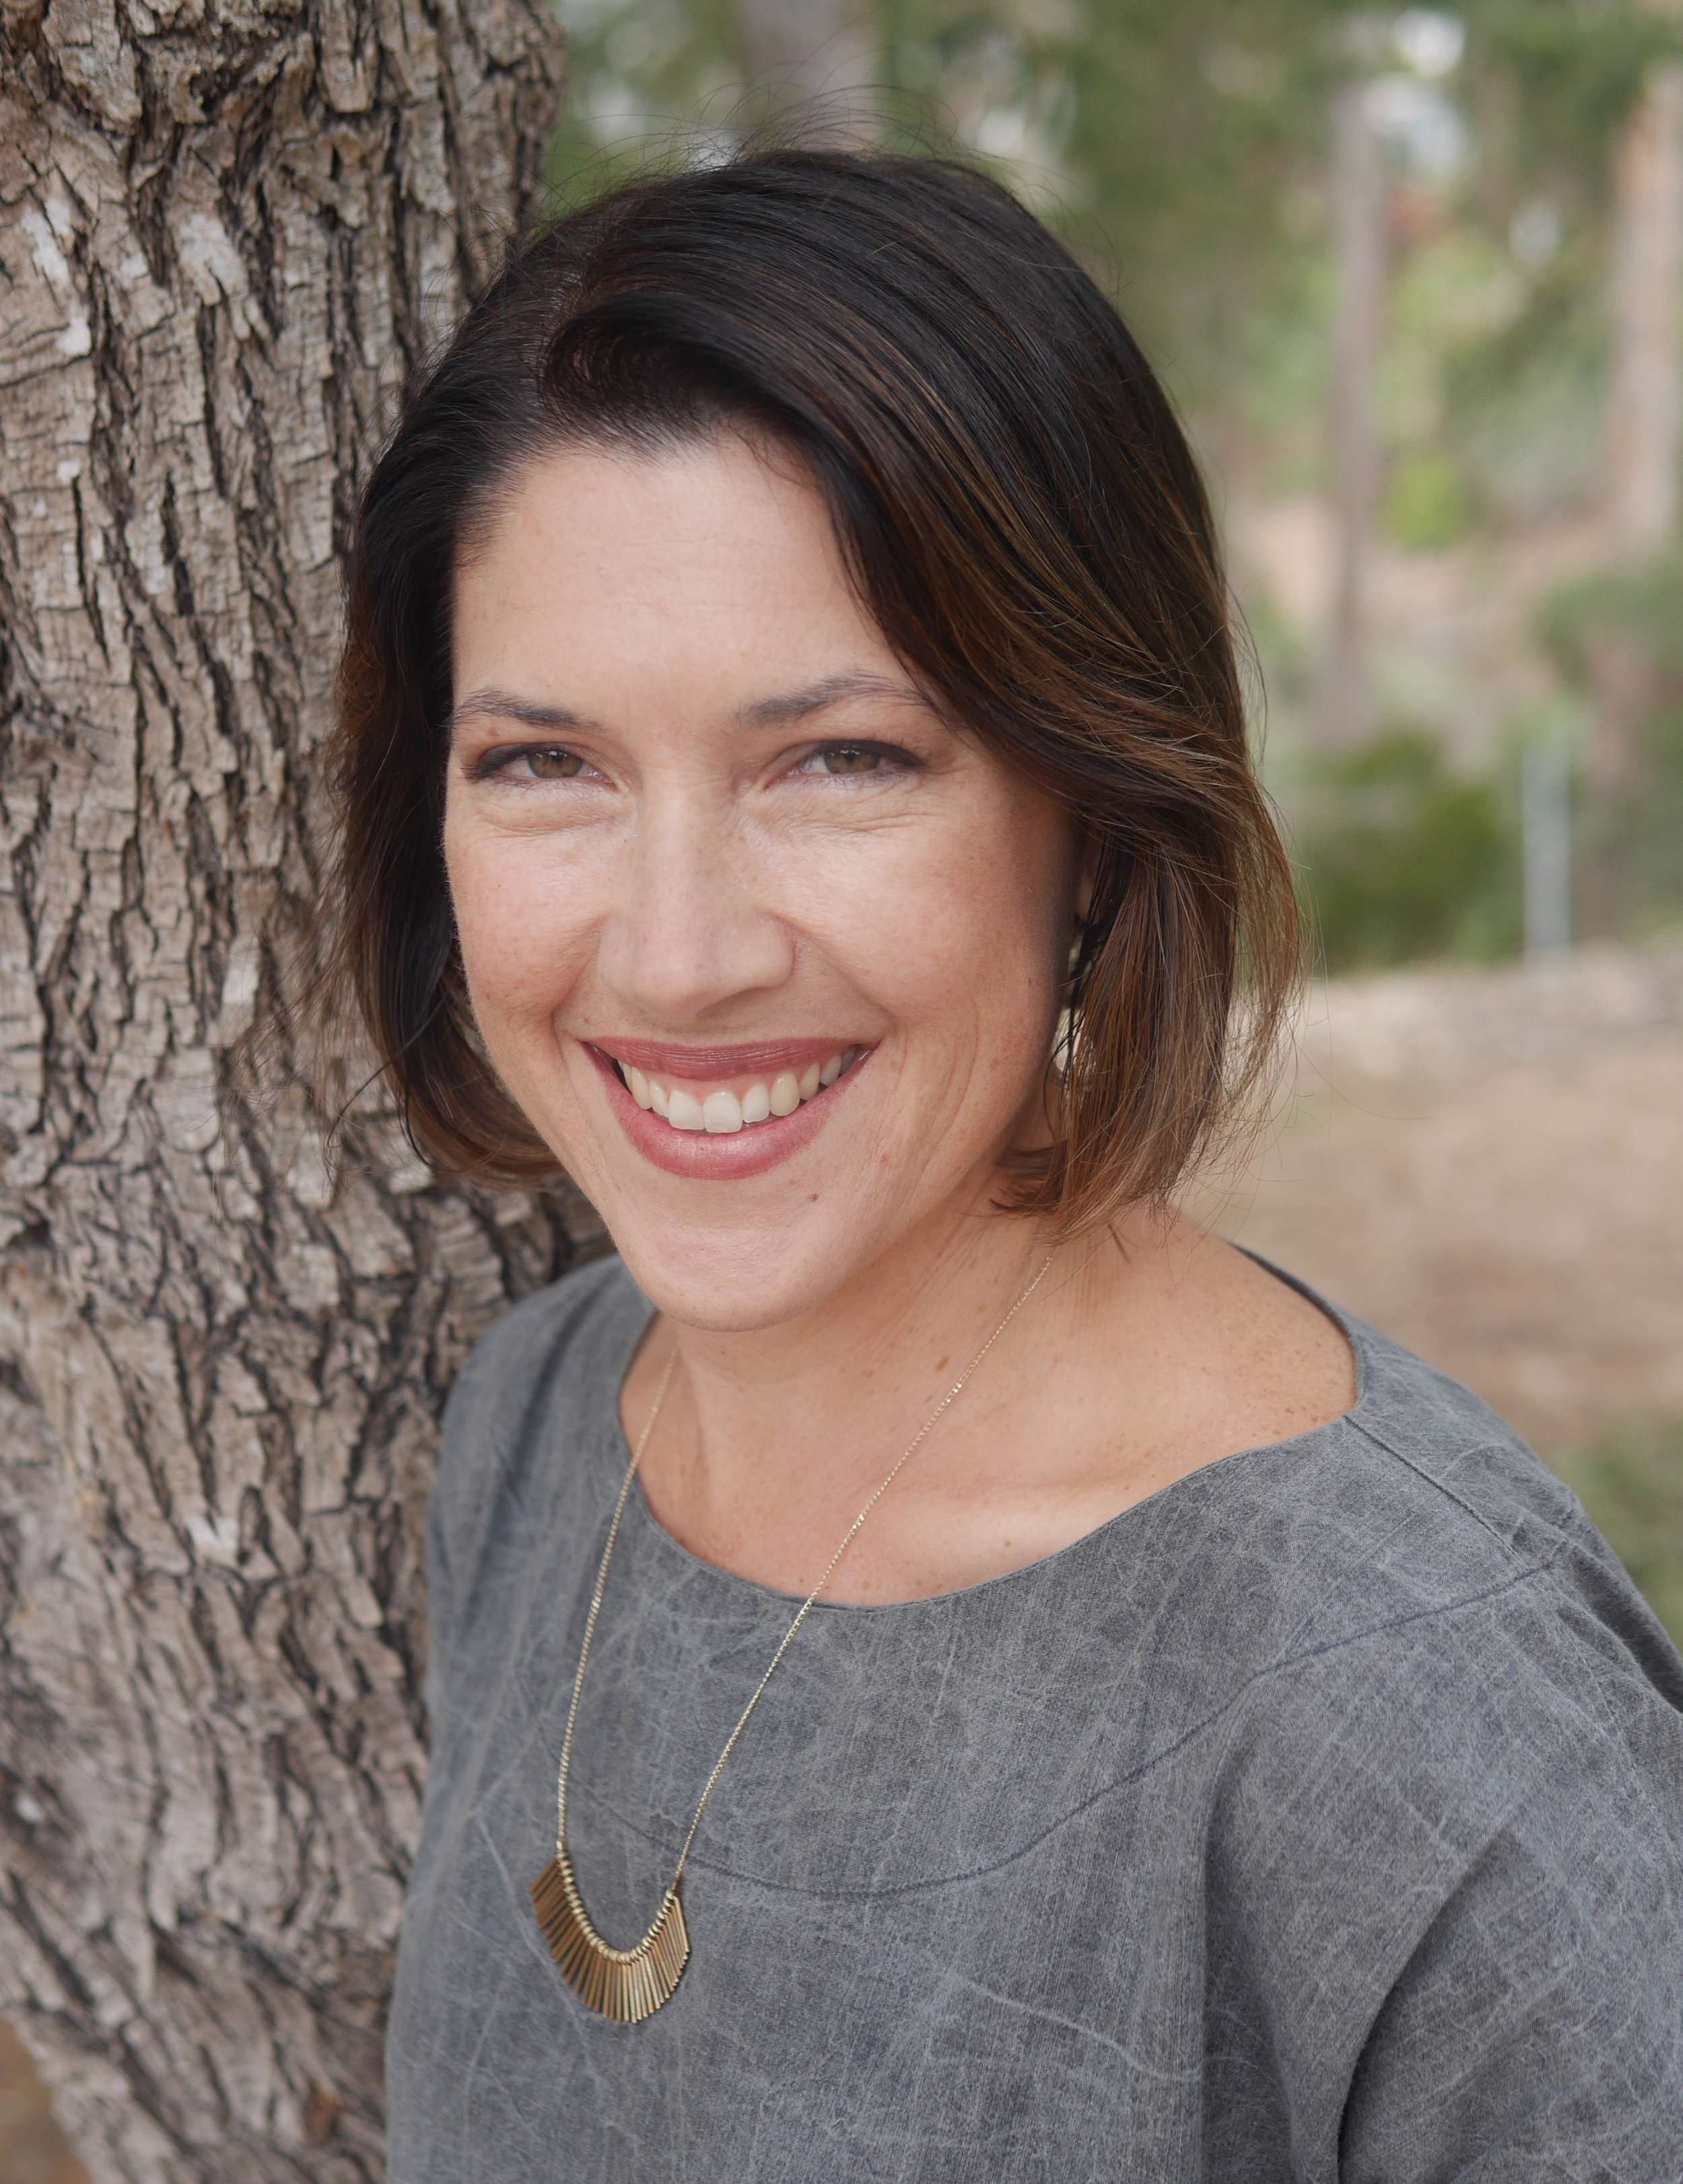 Acupuncturist Anne Chiaramonte